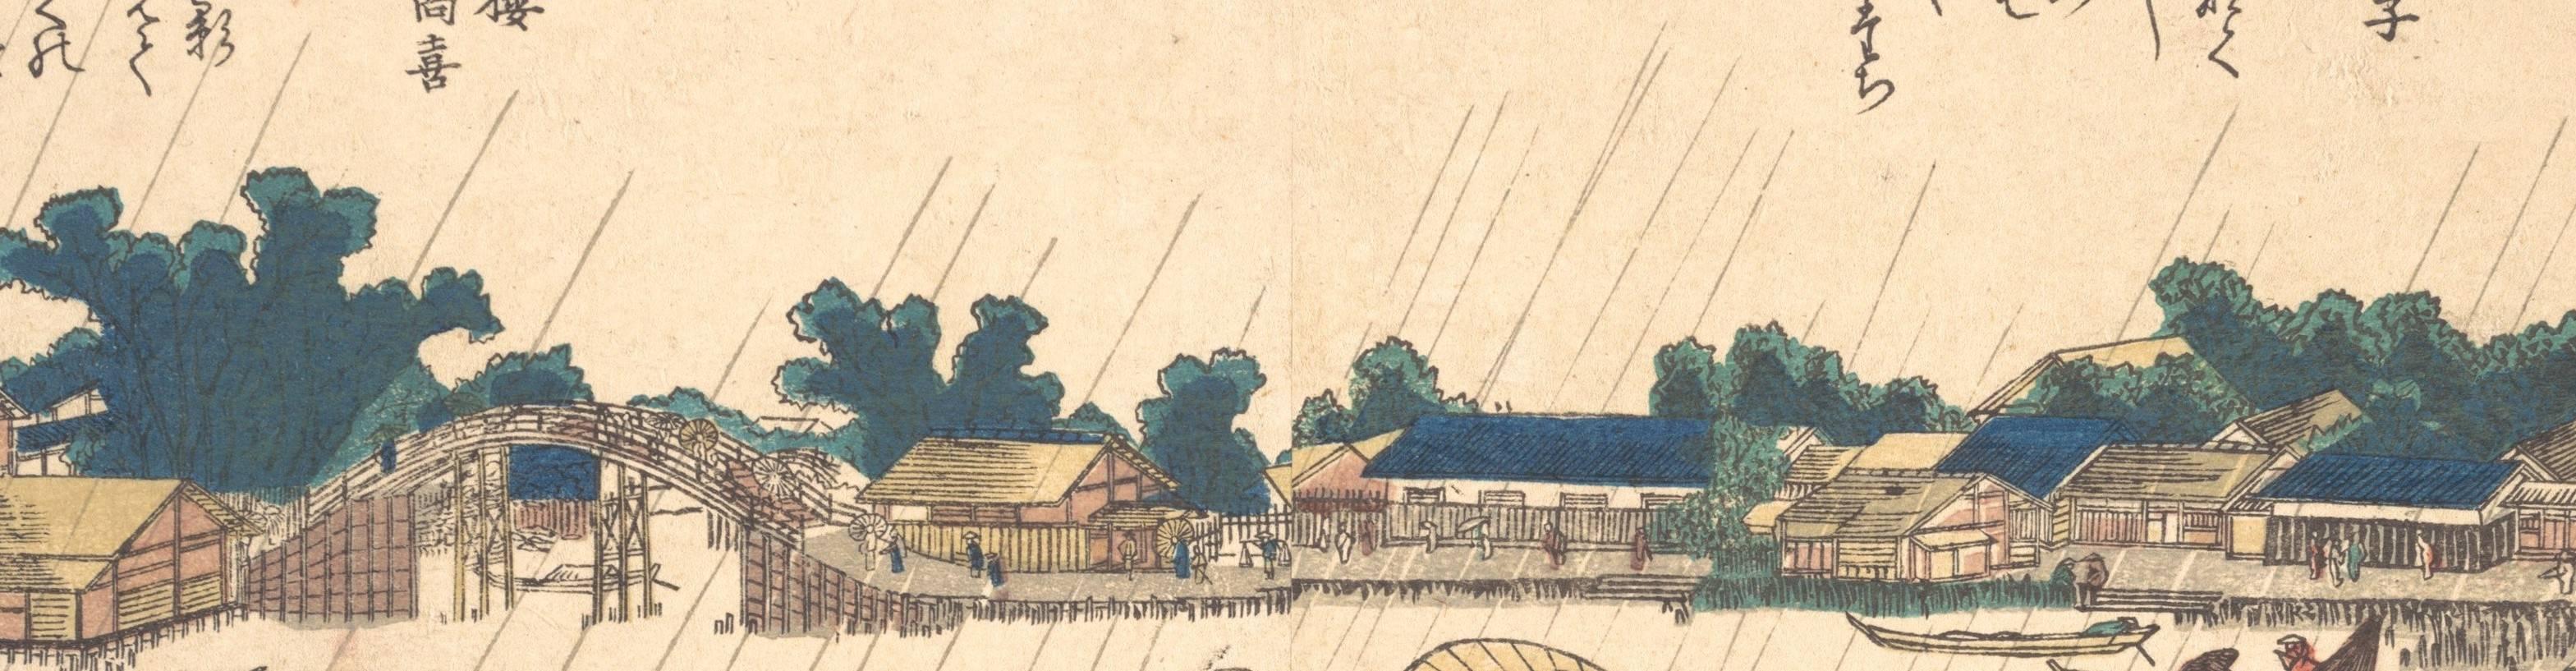 virmuze exhibit The View of Edo Period: Flora, Landscape, and Actors logo main banner